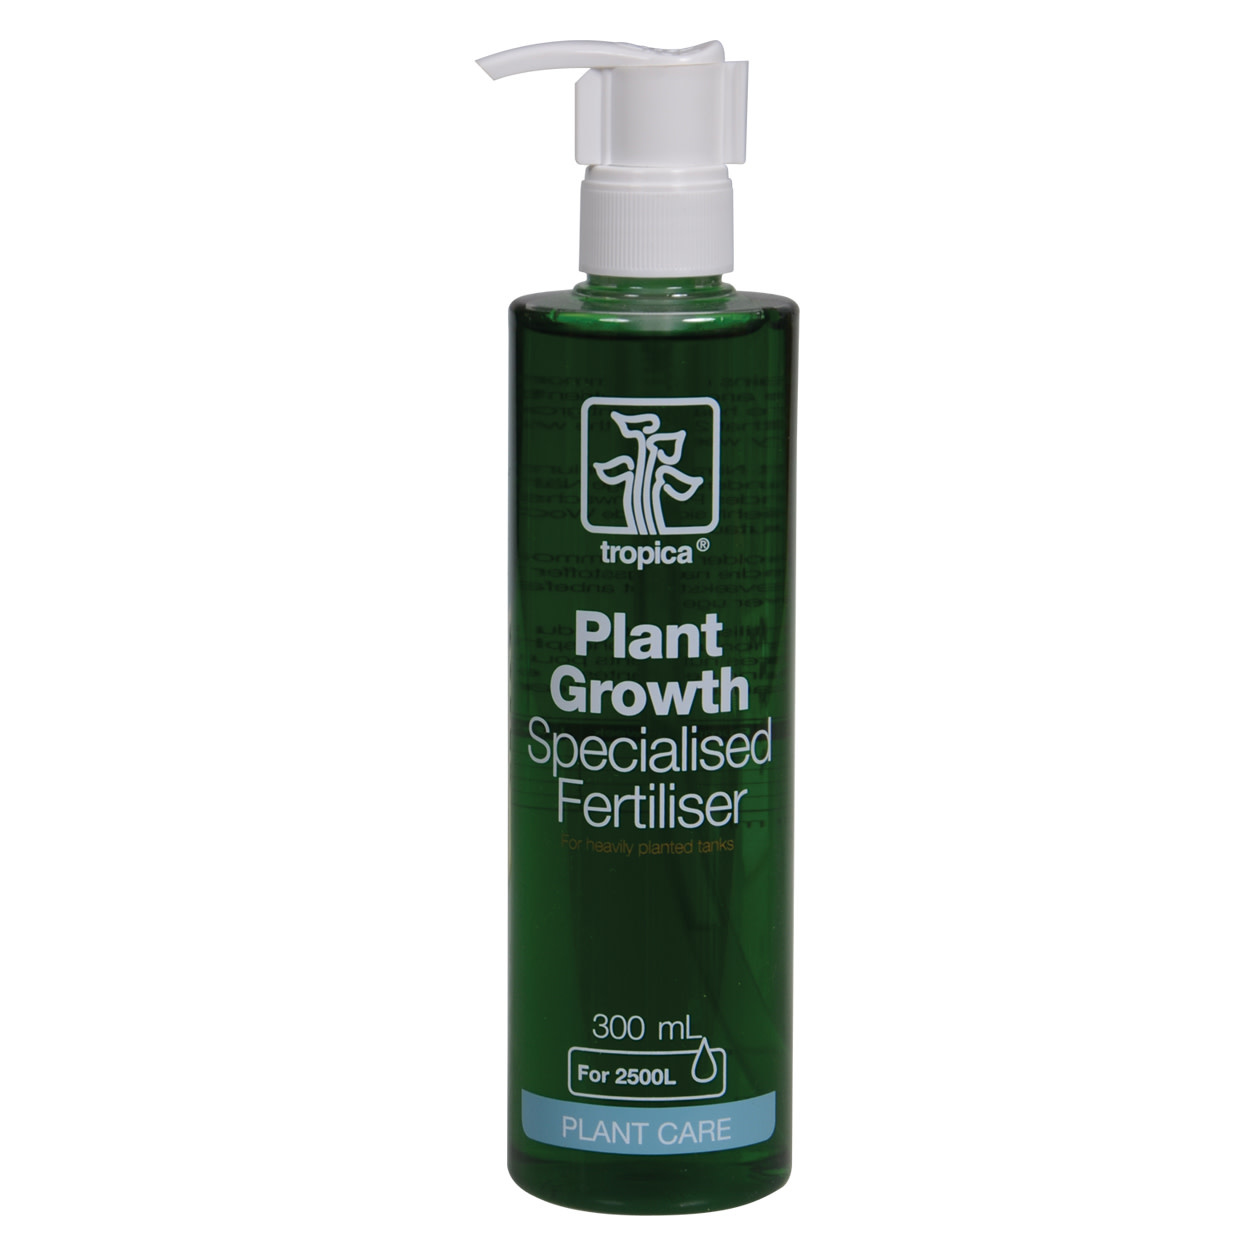 Tropica Tropica Plant Growth Specialised Fertilizer